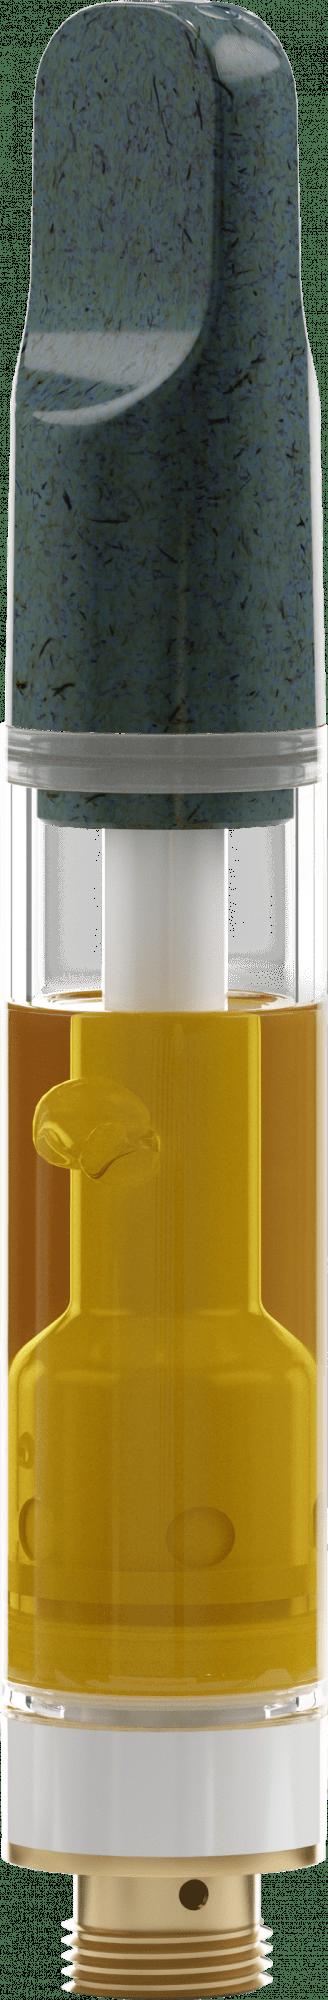 AVD hemp cannabis oil vape mouthpieces